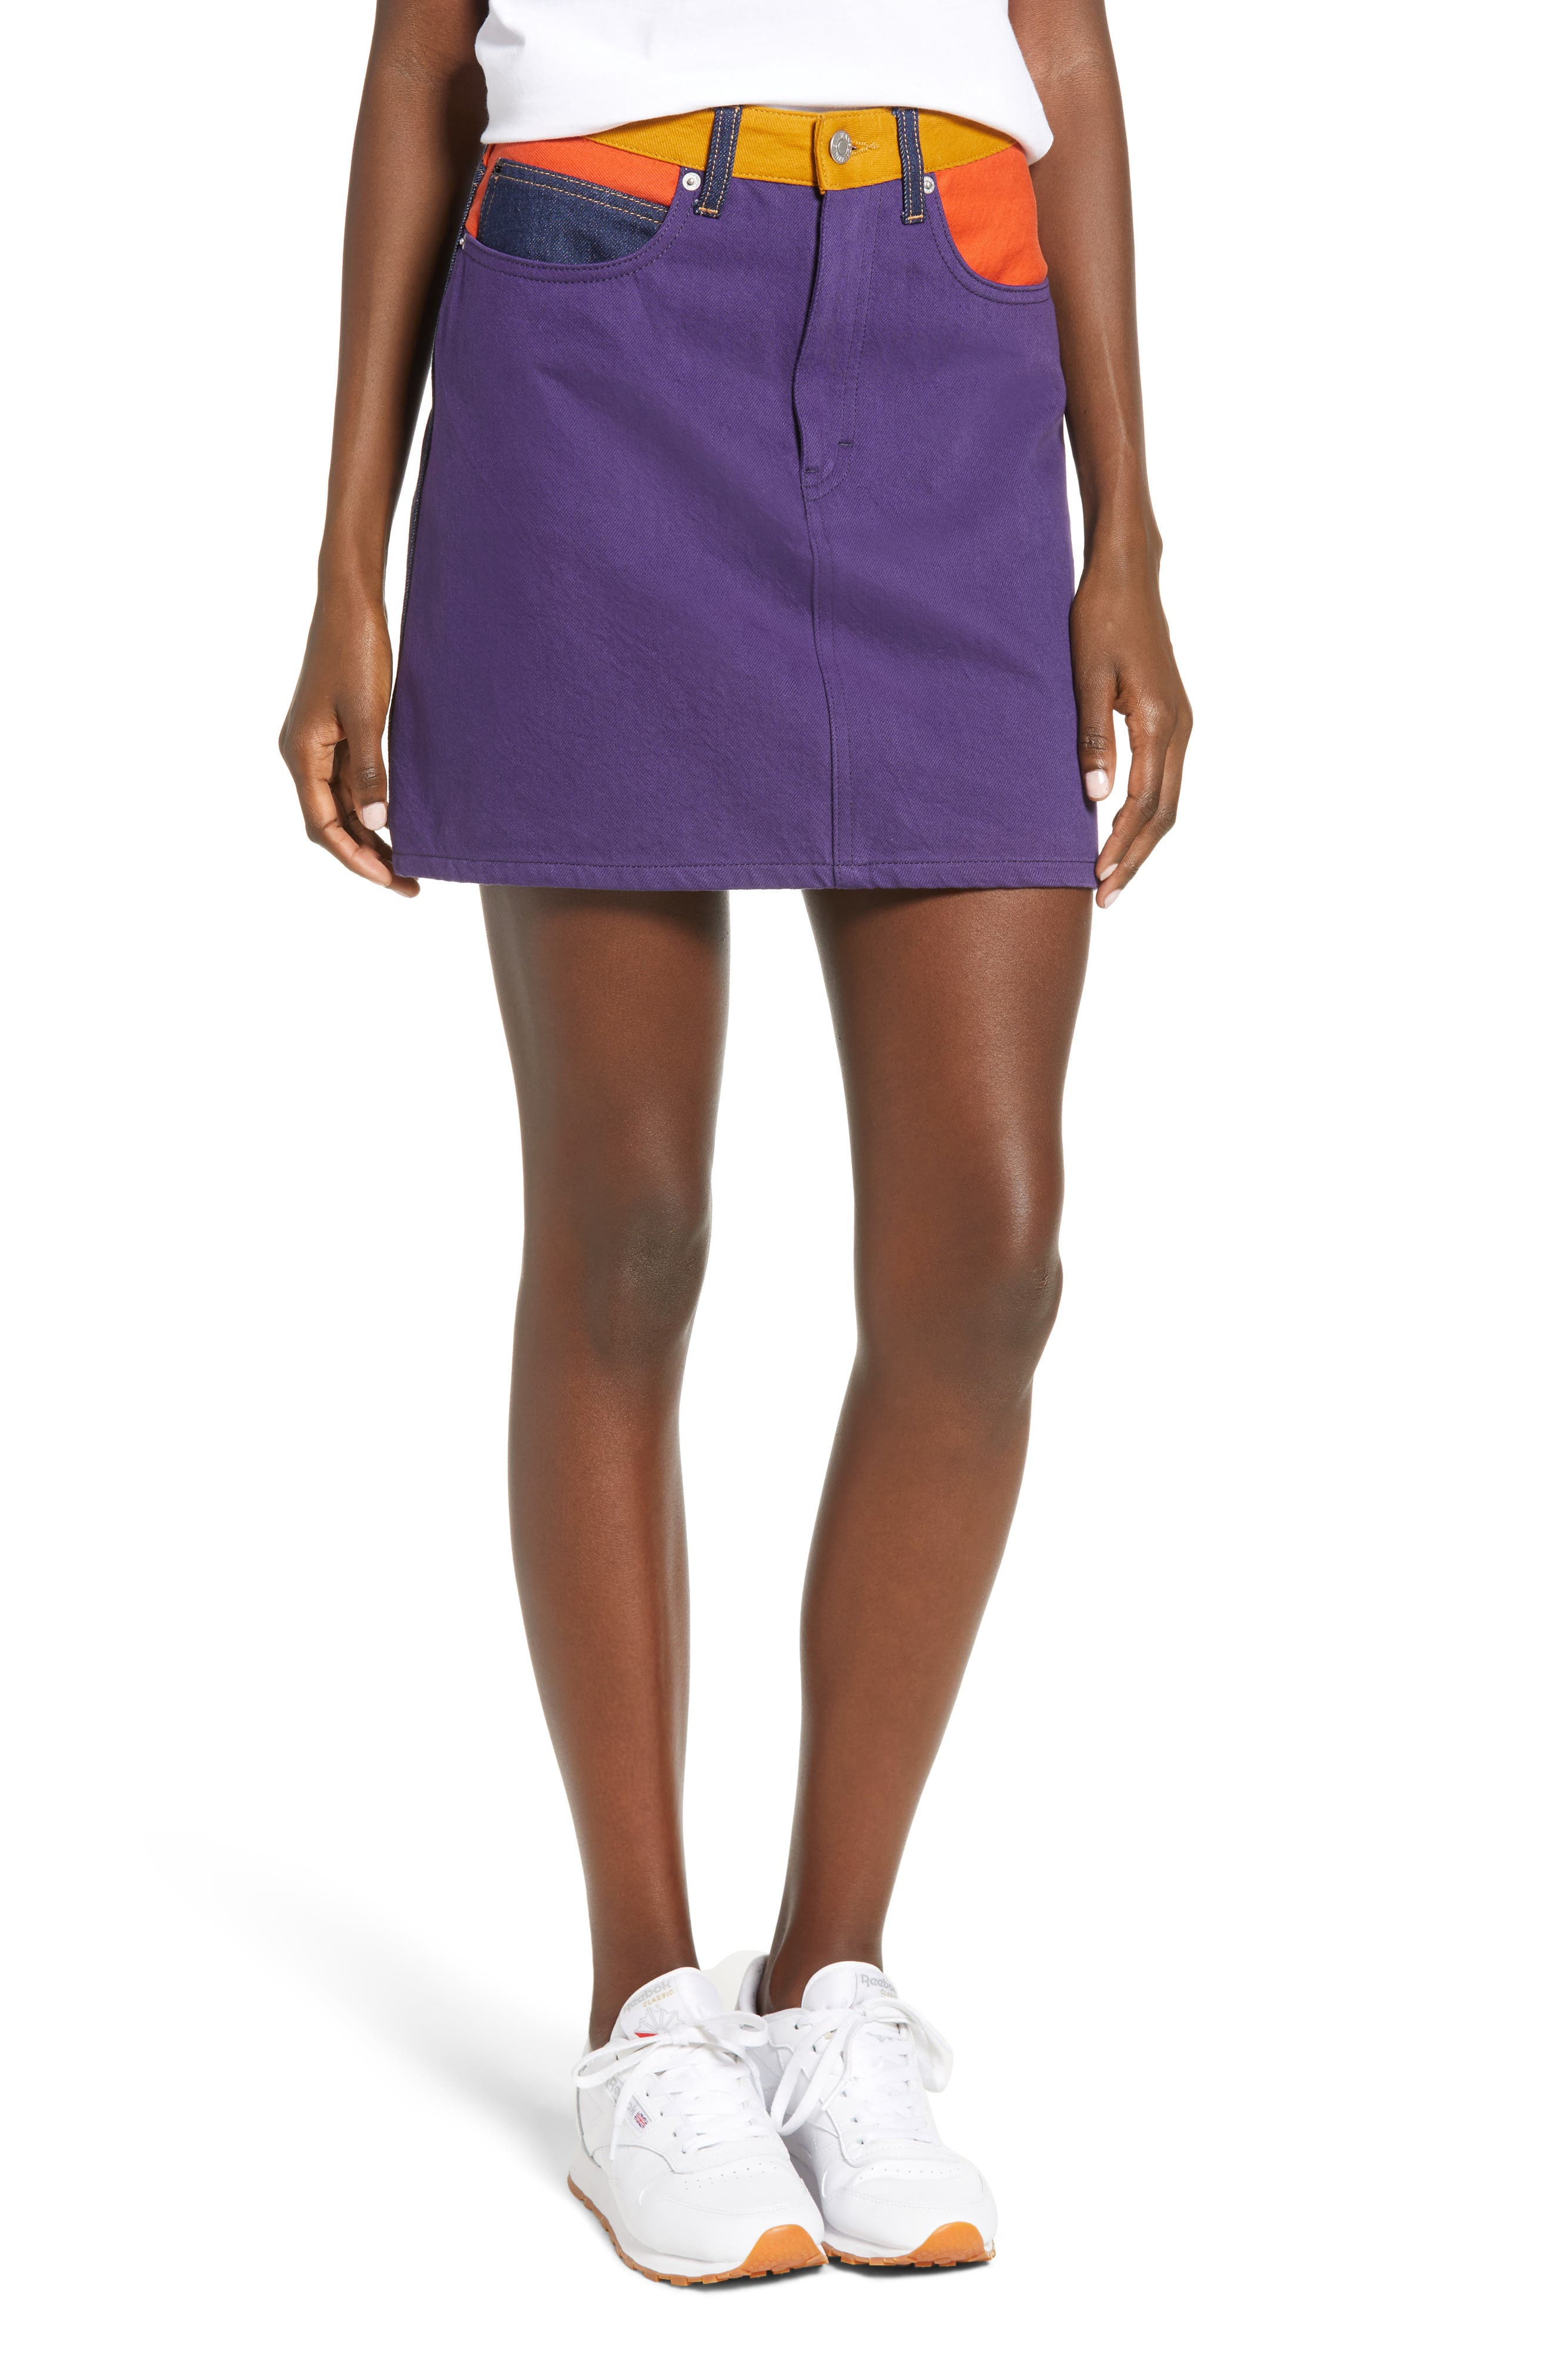 HR Miniskirt,                             Main thumbnail 1, color,                             UKELELY PATCH